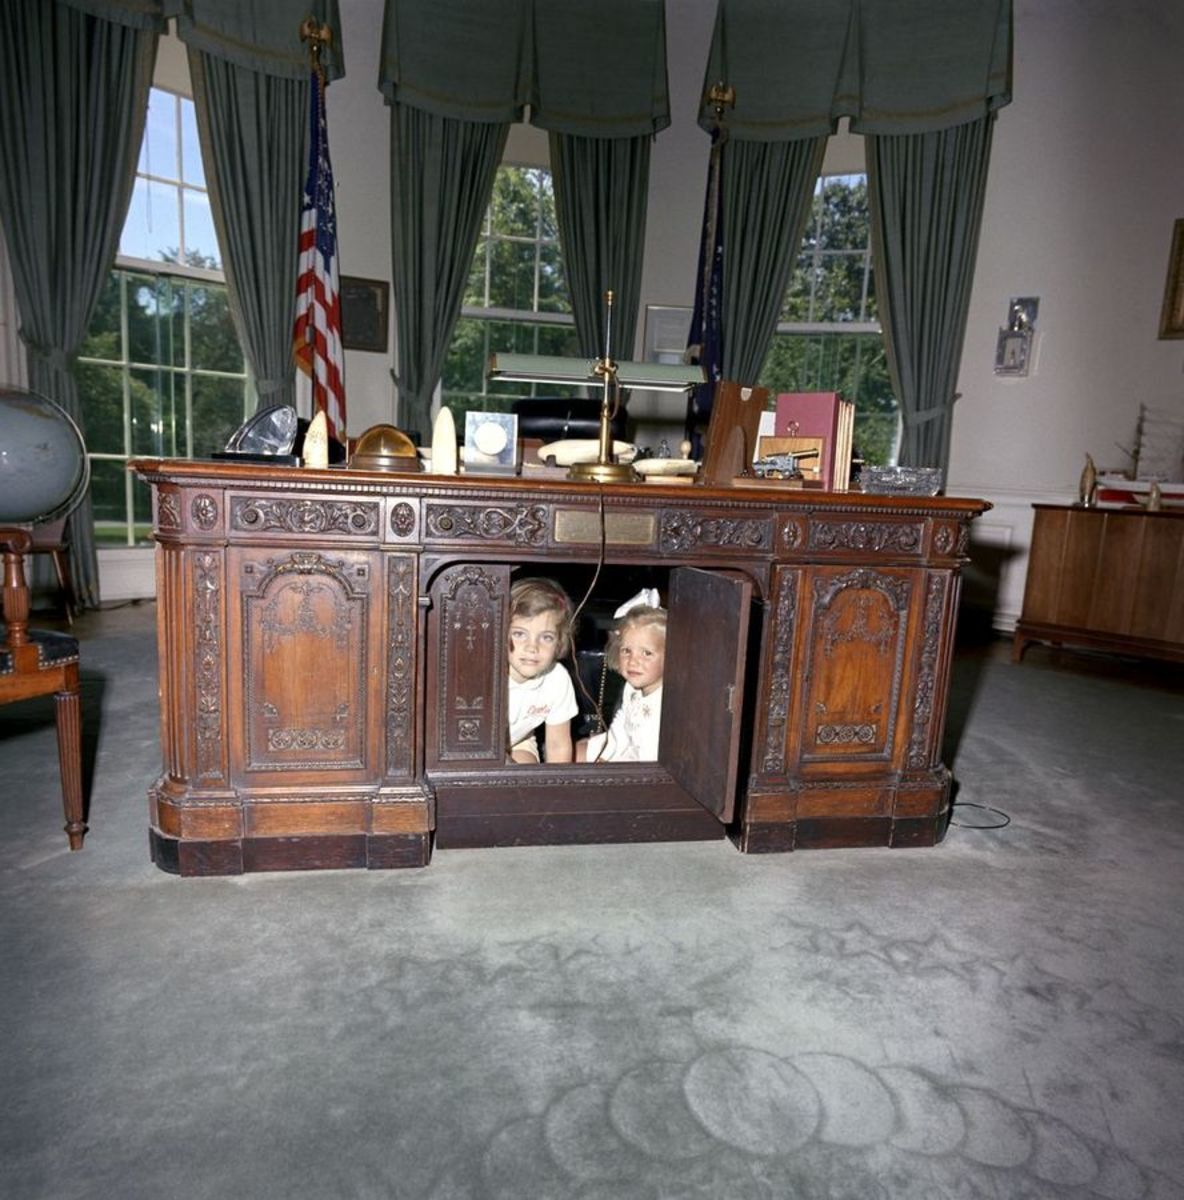 Kennedy children peek out through the kneehole door.